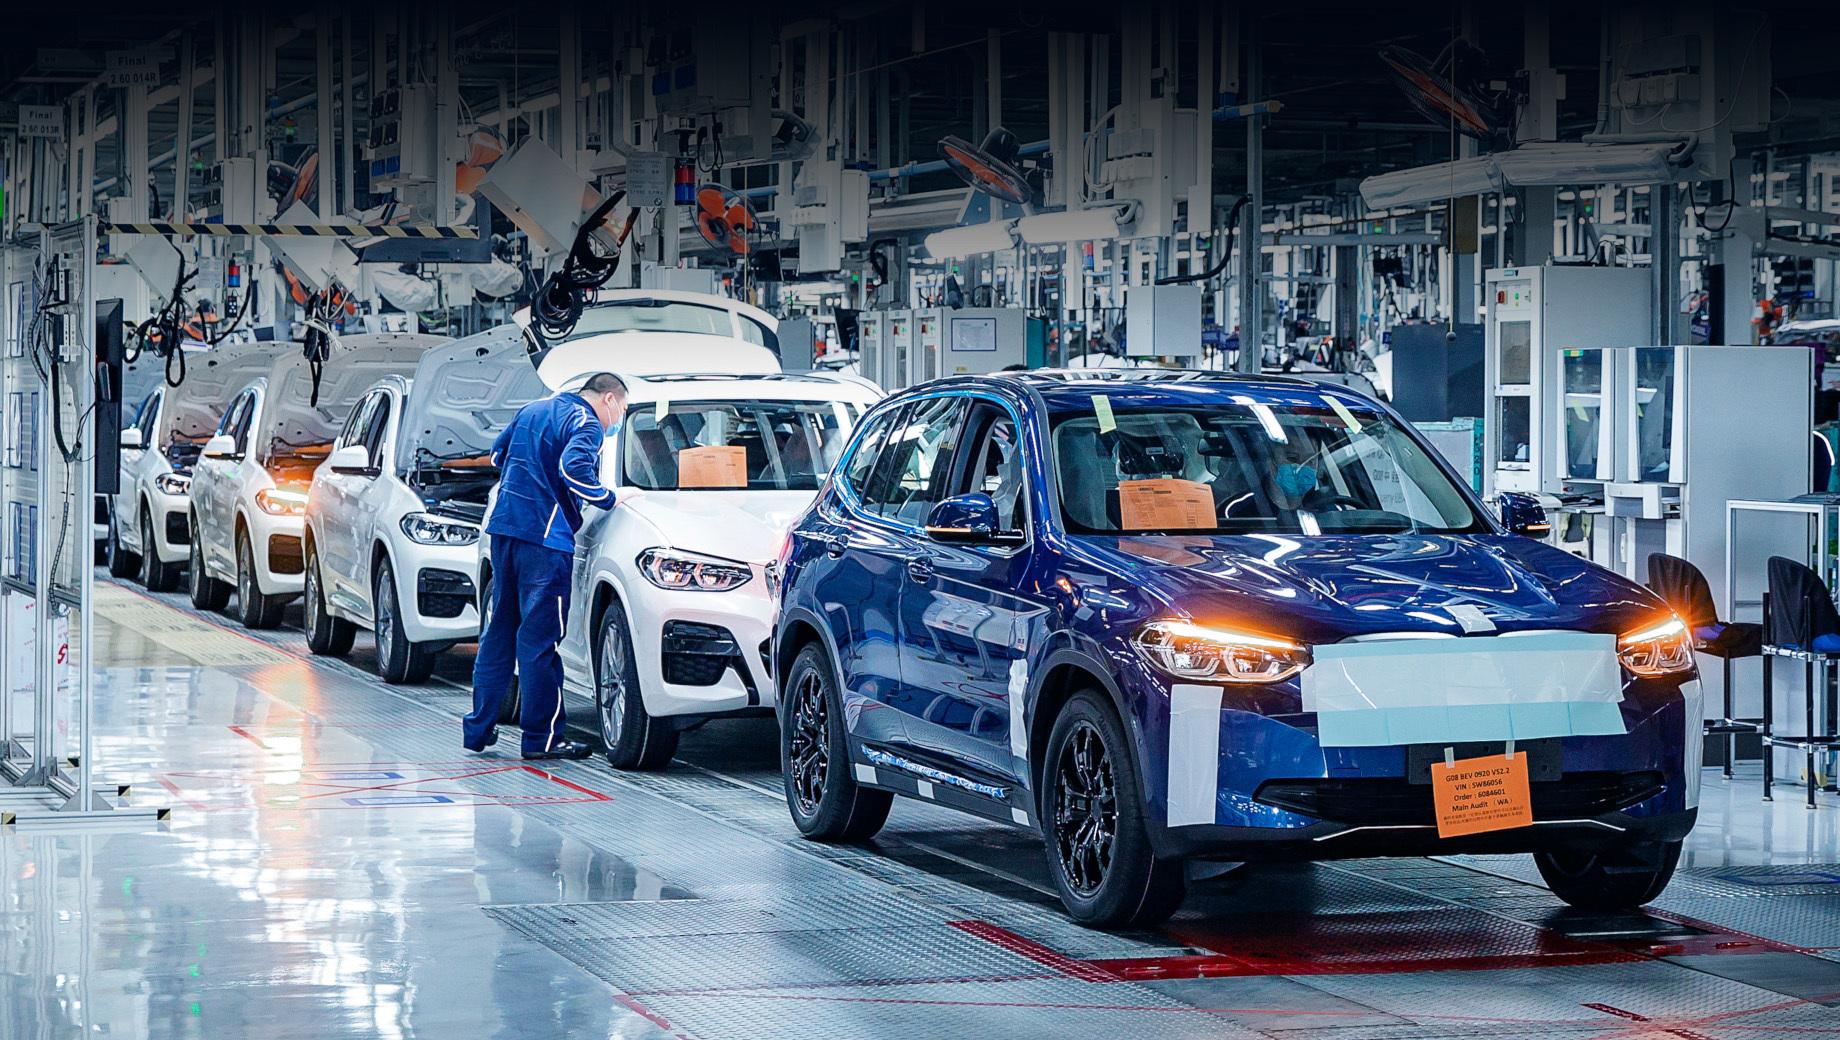 Электрокар BMW iX3 прошёл омологацию в Европе и Китае